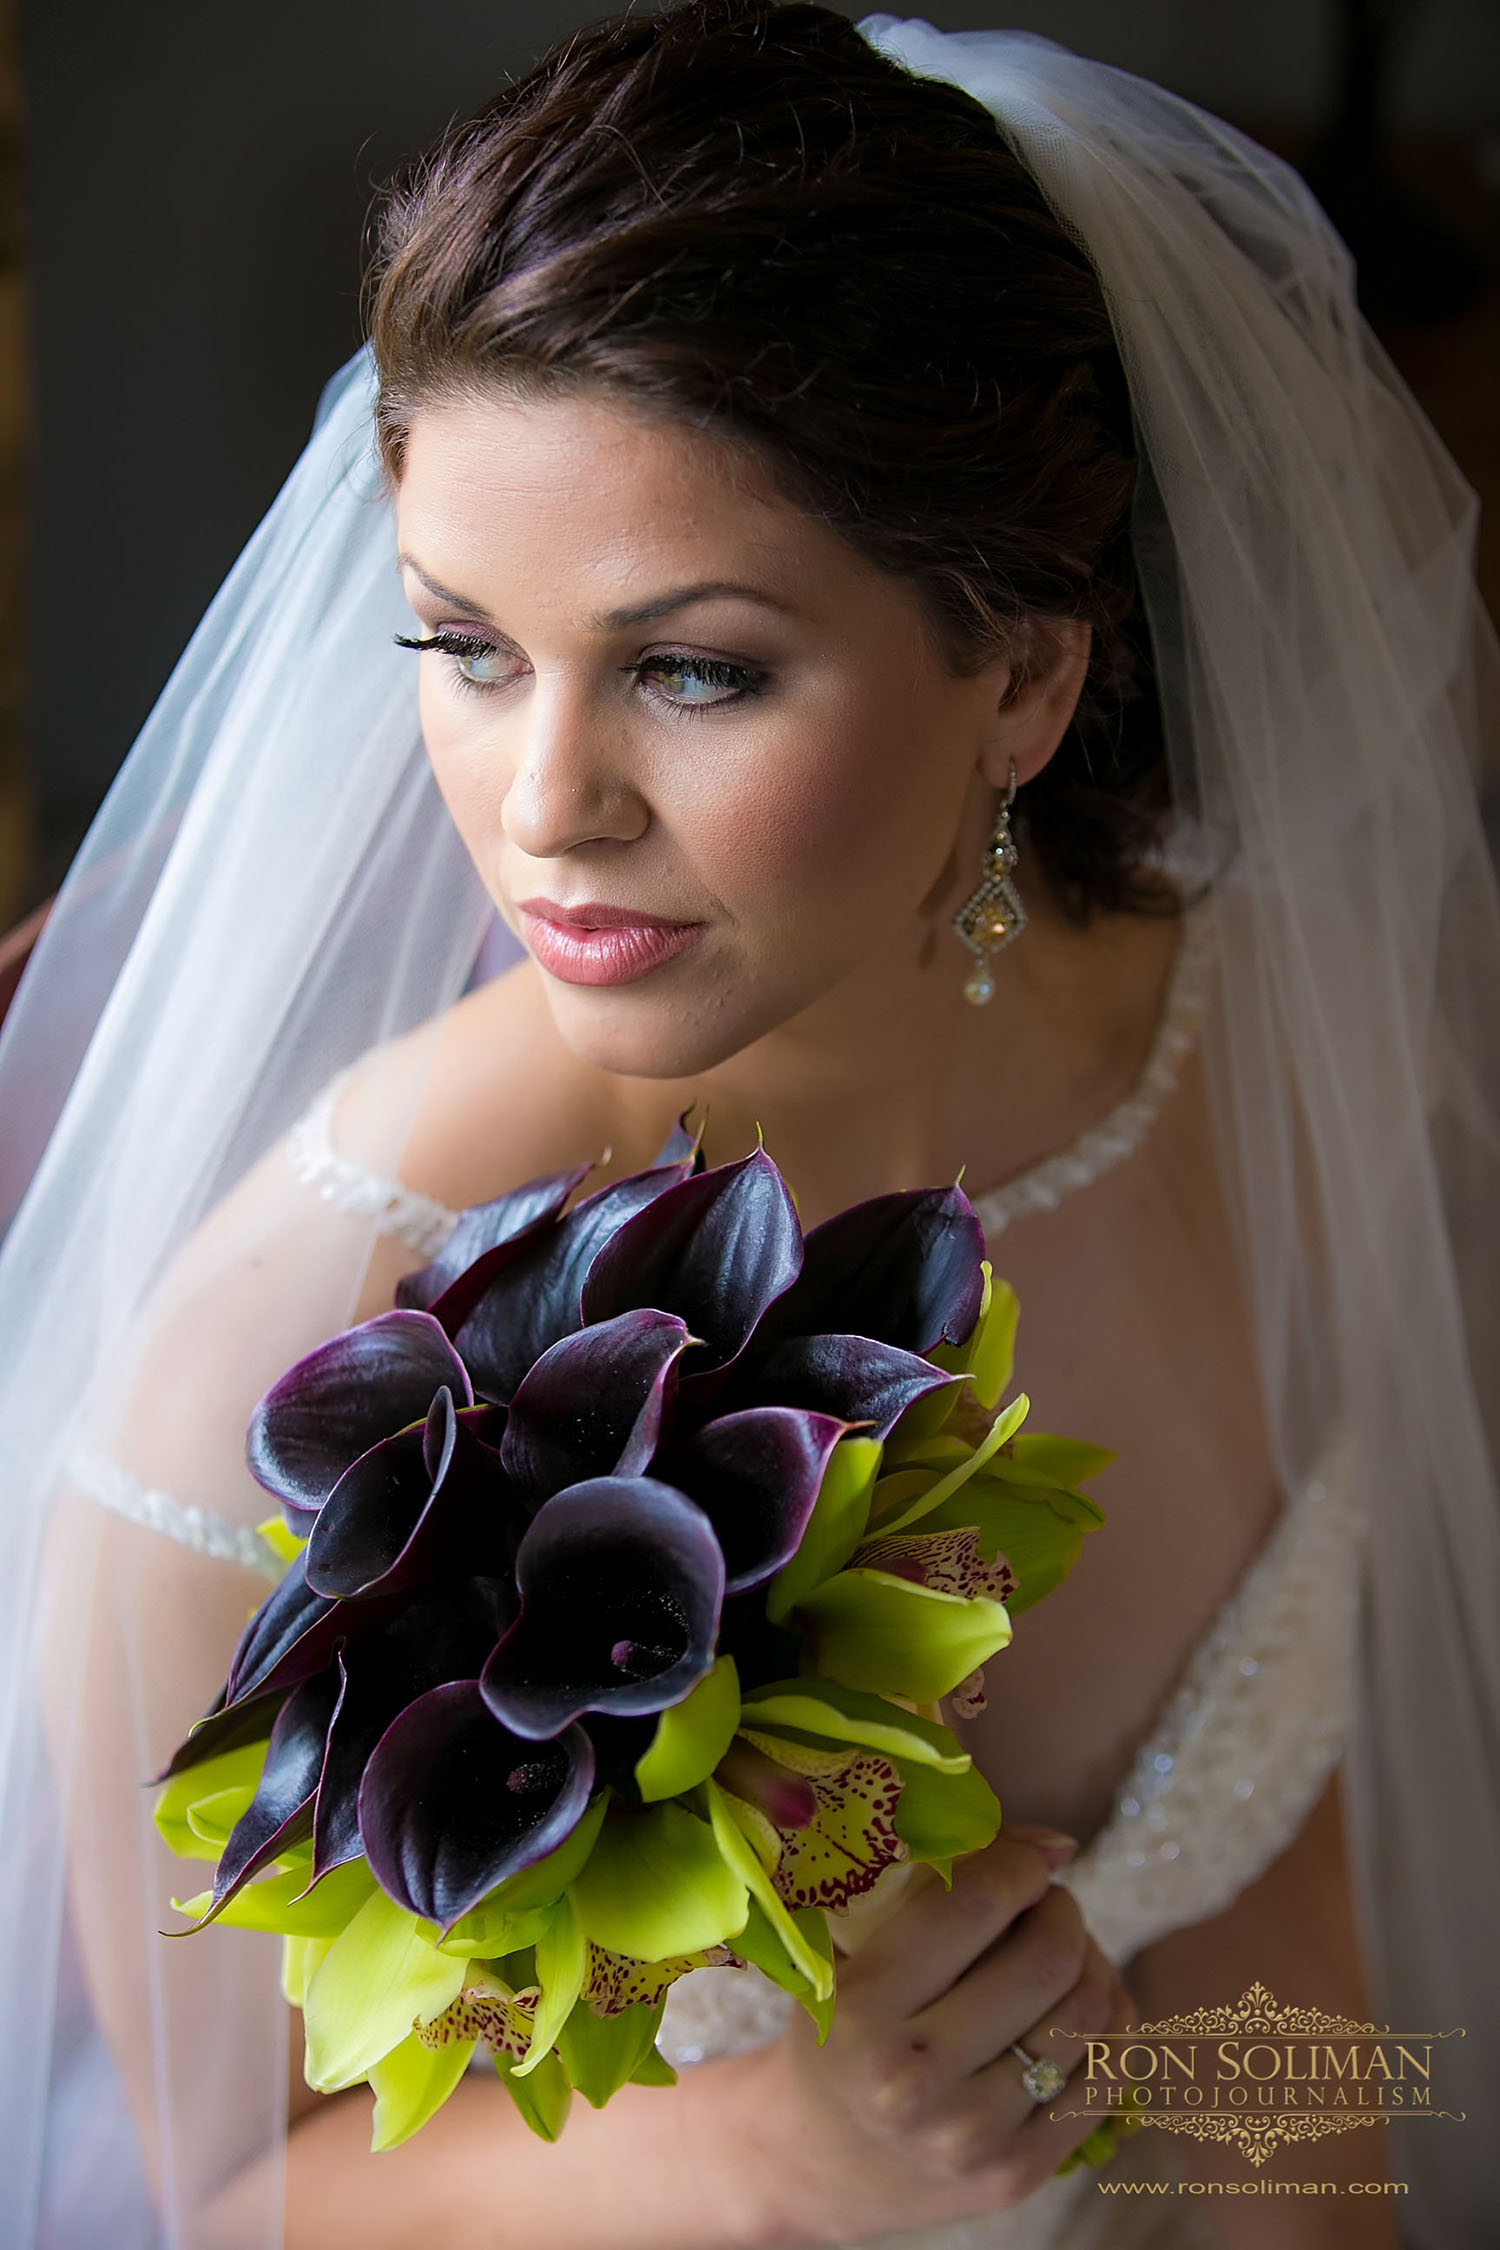 Ron SolimanPhotojournalism    Wedding Reception   Sweetwater Farm, Glen Mills, PA